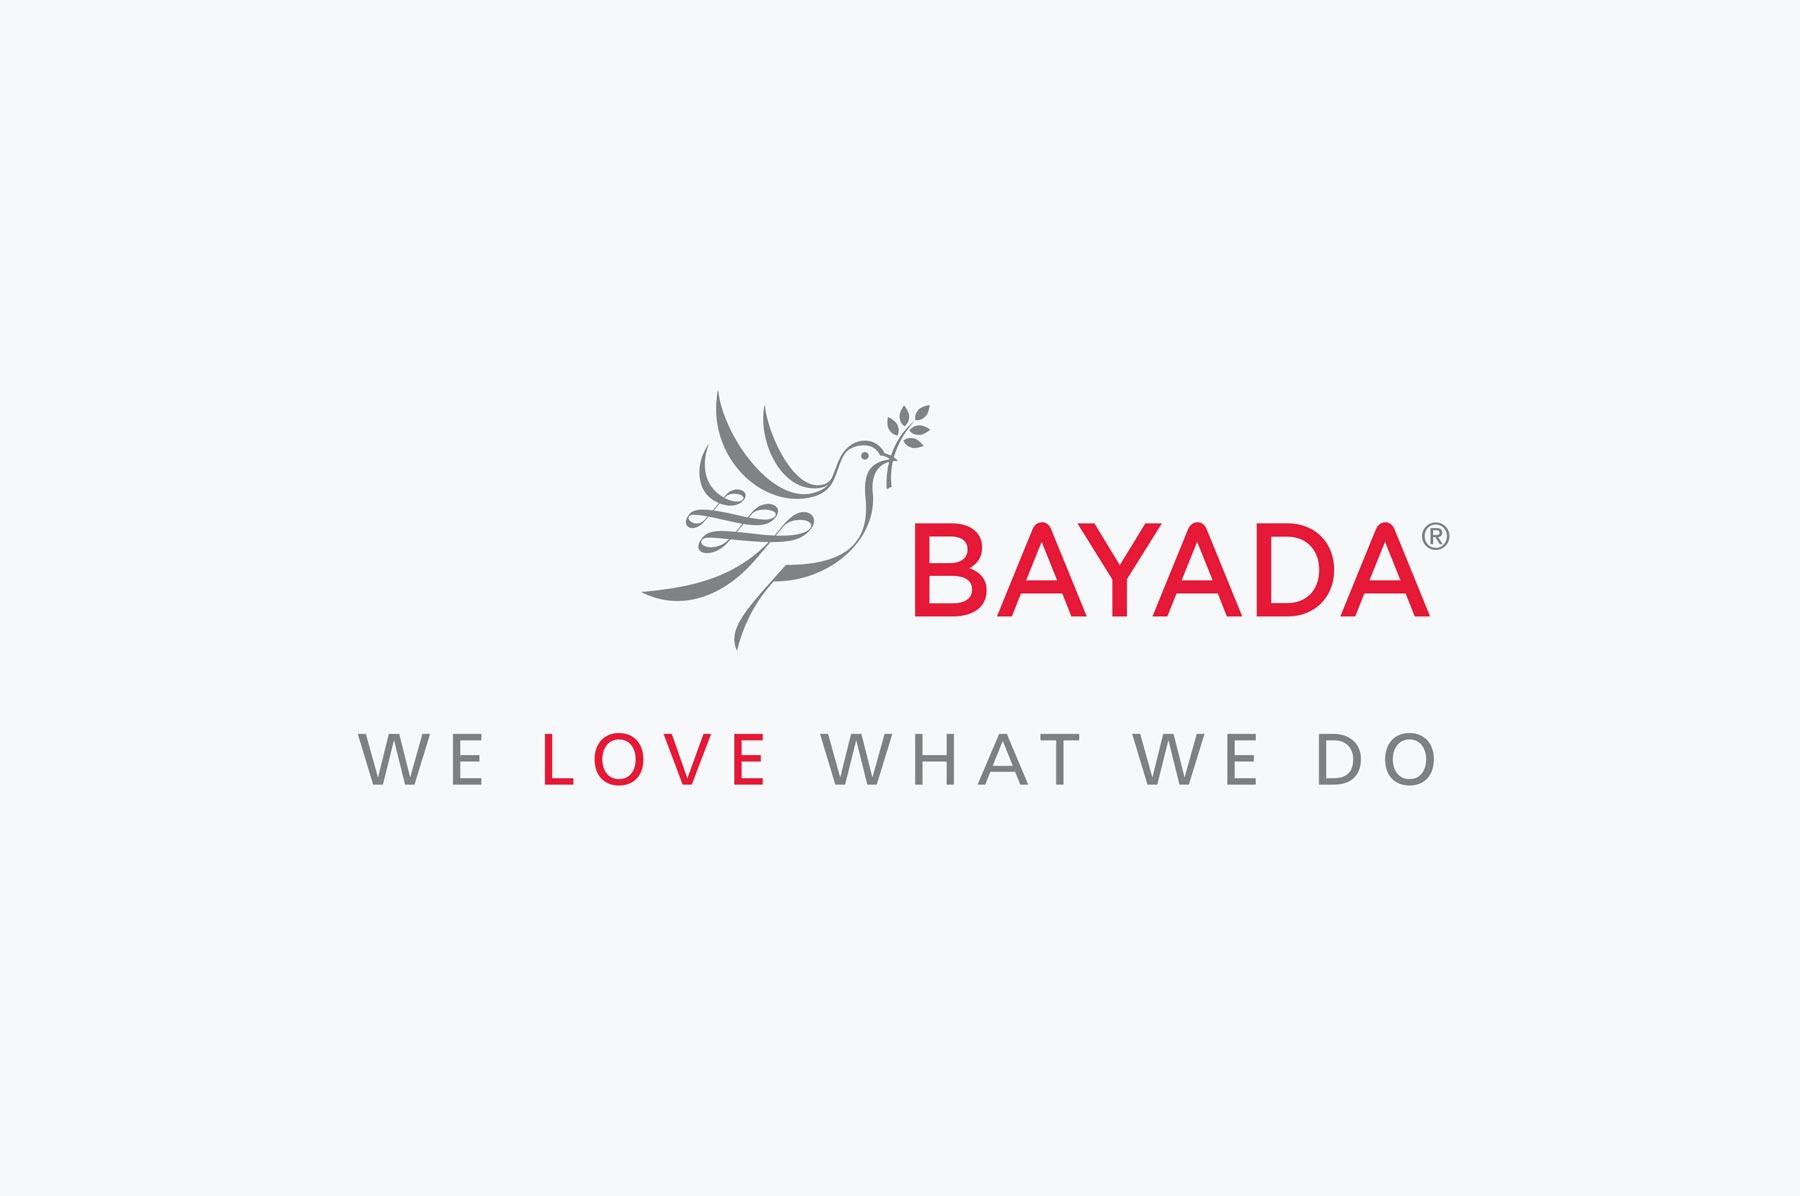 Bayada Employee Login – Step By Step Login Process